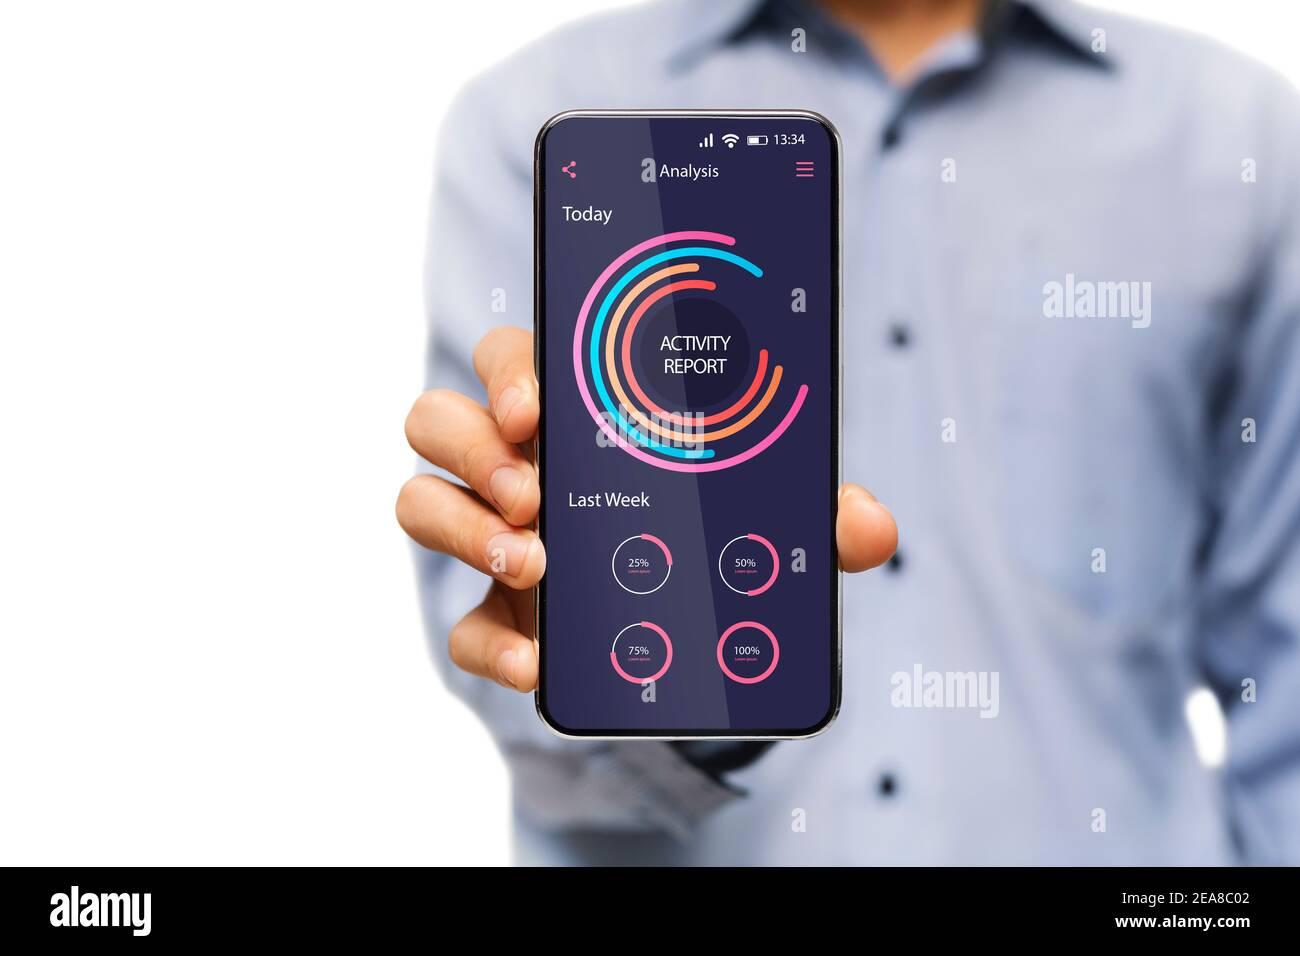 Hombre con smartphone con aplicación de análisis de datos e informe de actividad En pantalla Foto de stock